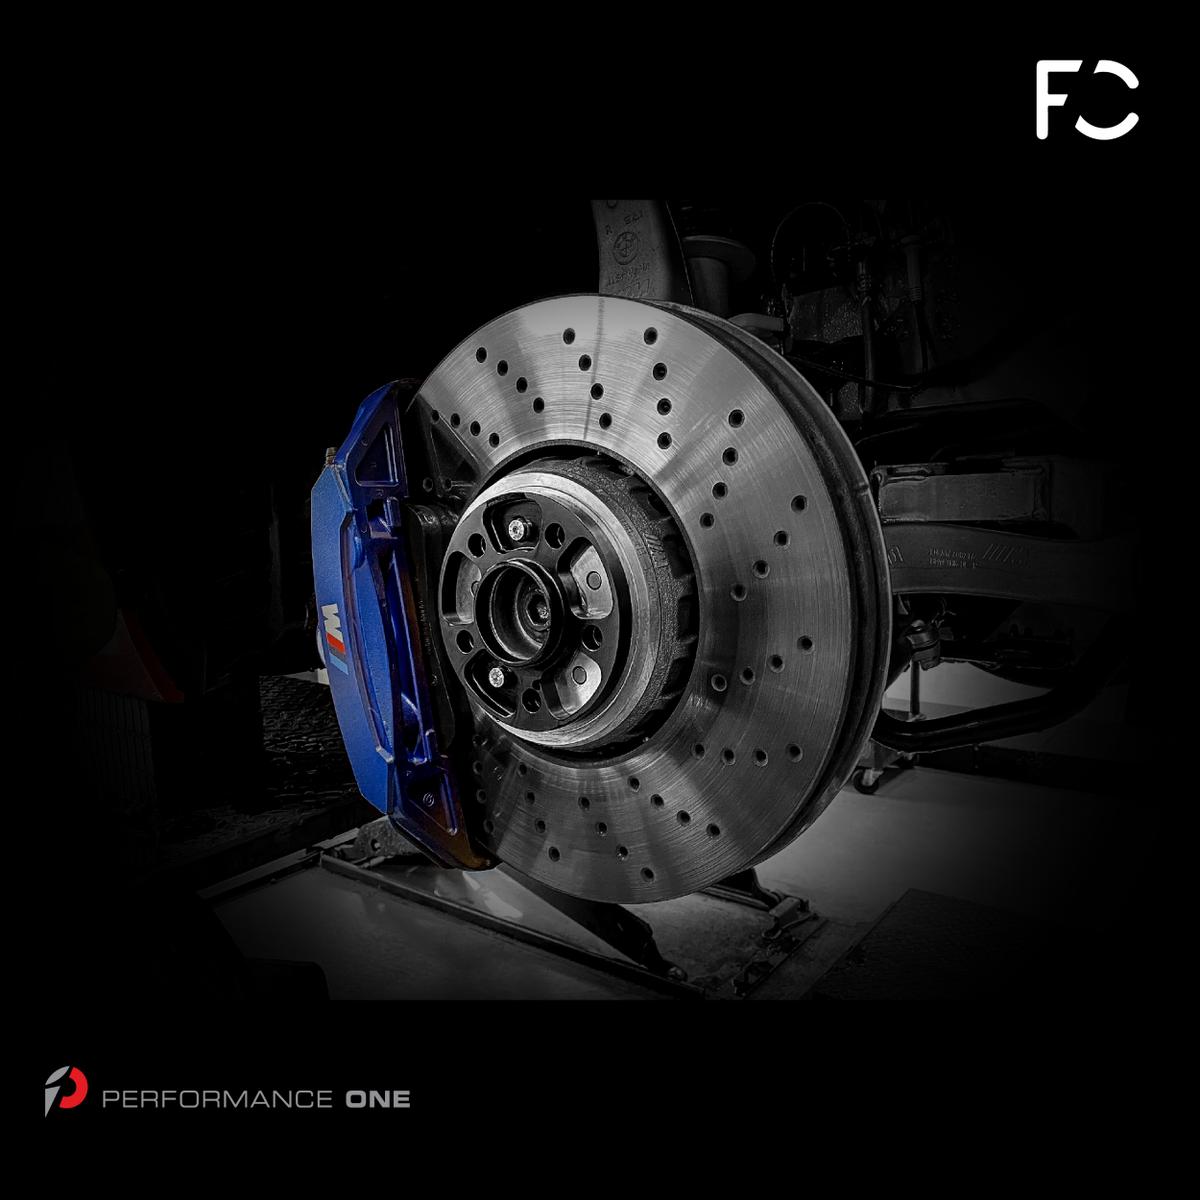 #futureclassic #wheelspacers for #BMW #F92 #M8 • #F92M8 #BMWM8 #bmwmotorsport #bmwm #mpower #bmwmpower #mcars #mperformance #bmwperformance #bmwmperformance #stance #performanceone #performance #awg #autowest #autowestgroup @IndStylepic.twitter.com/pekXZrR0kG